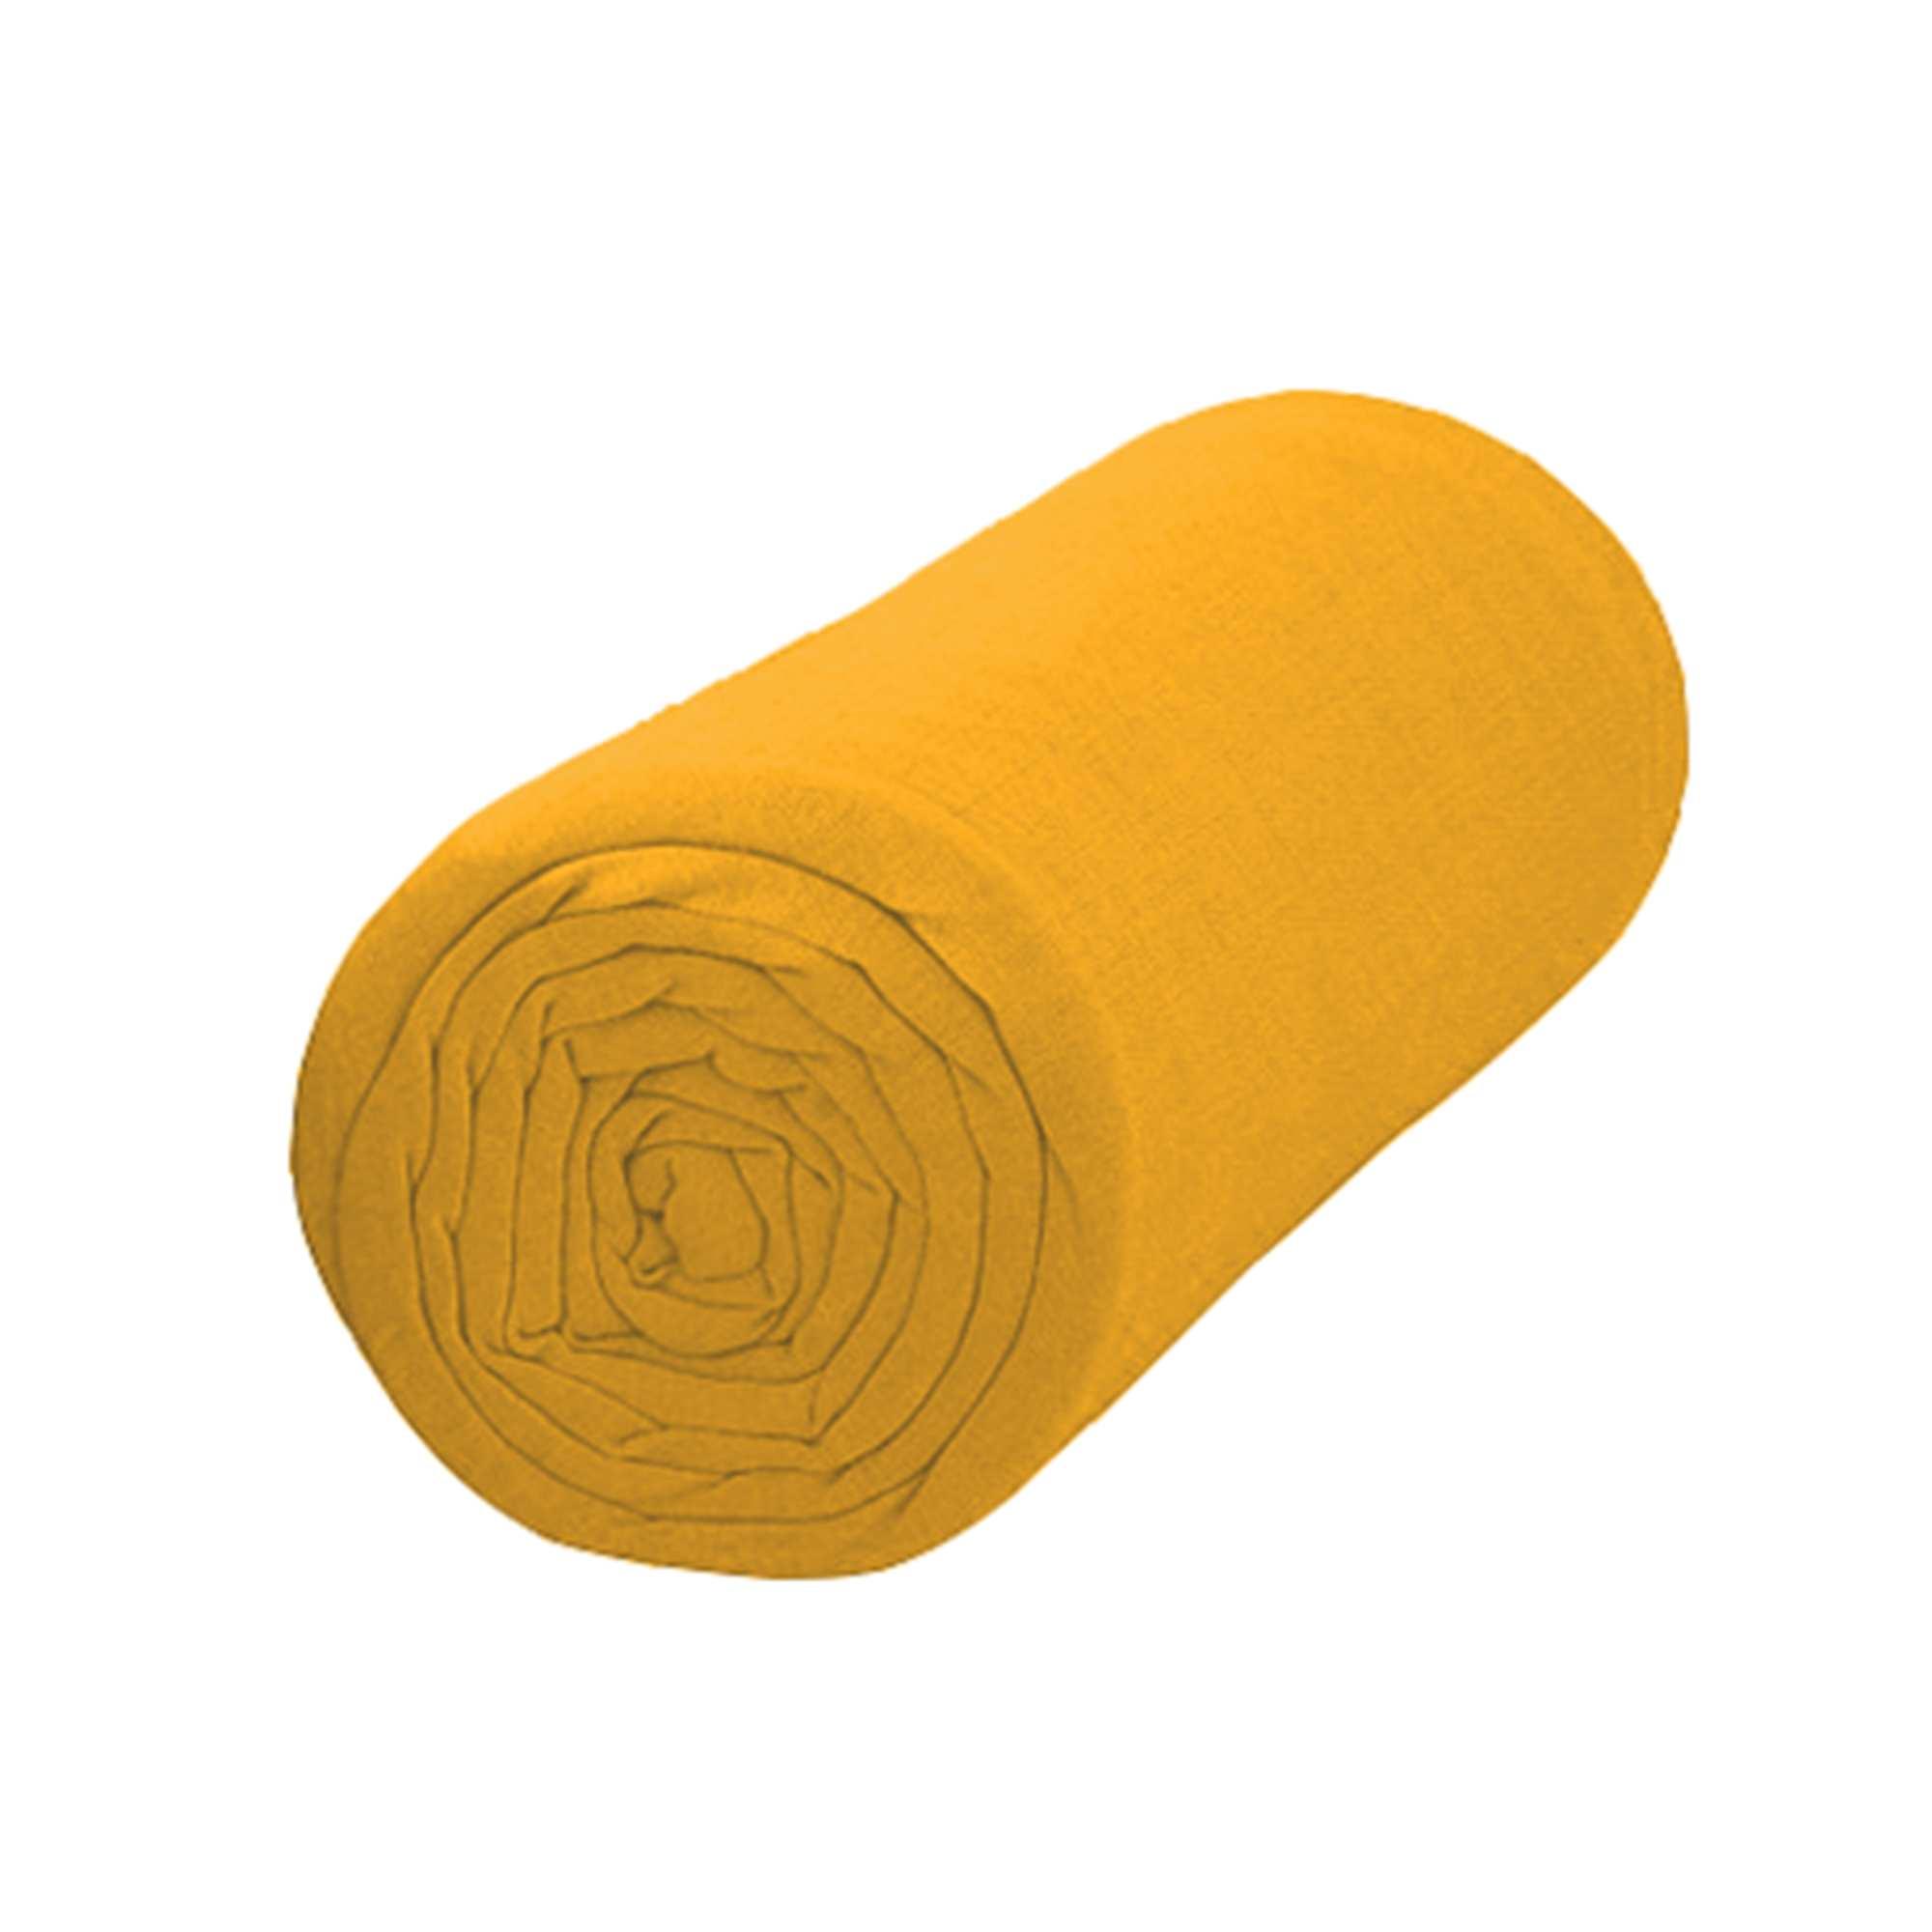 Drap housse uni 90 x 200 Linge de lit   jaune moutarde   Kiabi